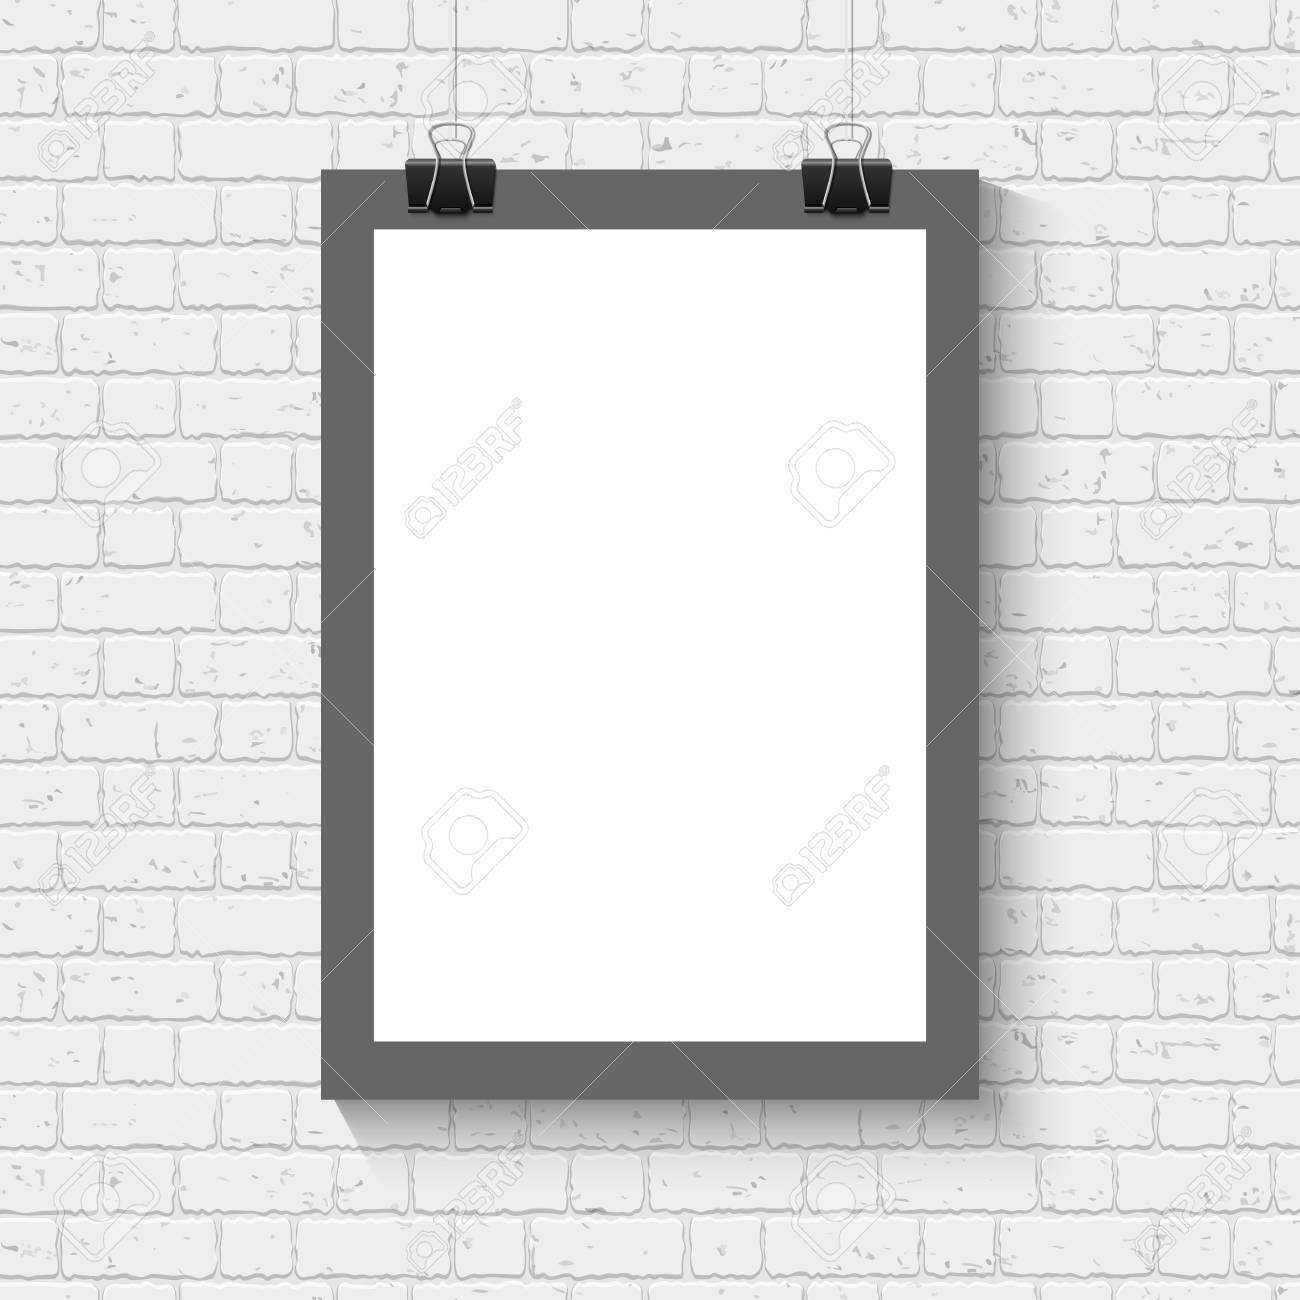 Vektor Leeres Weißes Blatt Papier Plakat Mit Schwarzem Rahmen Mock ...